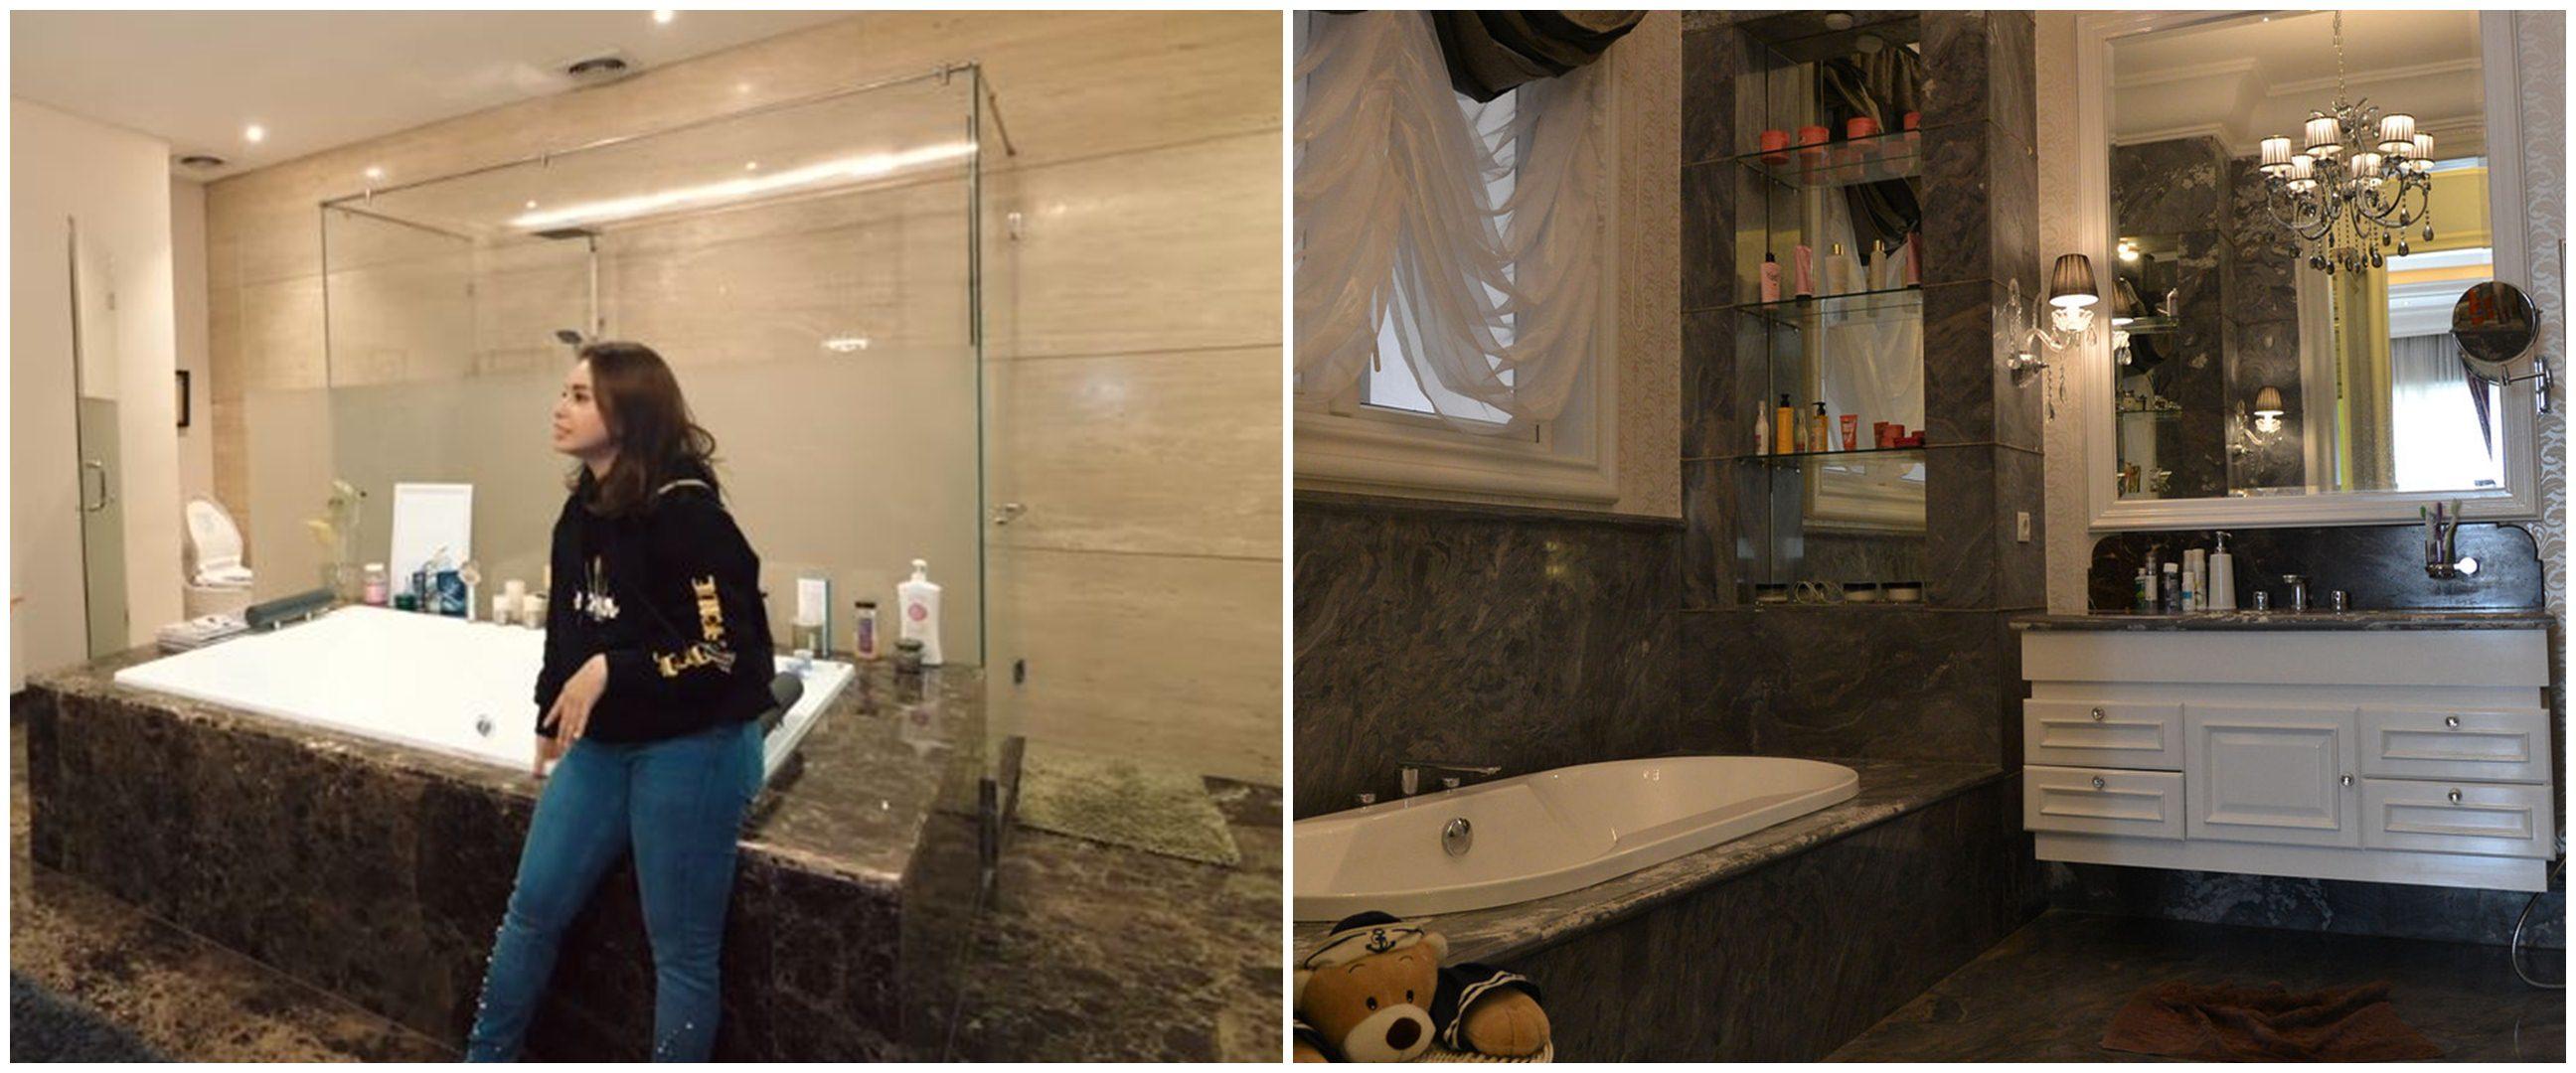 Penampakan kamar mandi 5 presenter Tanah Air, mewah dan cozy